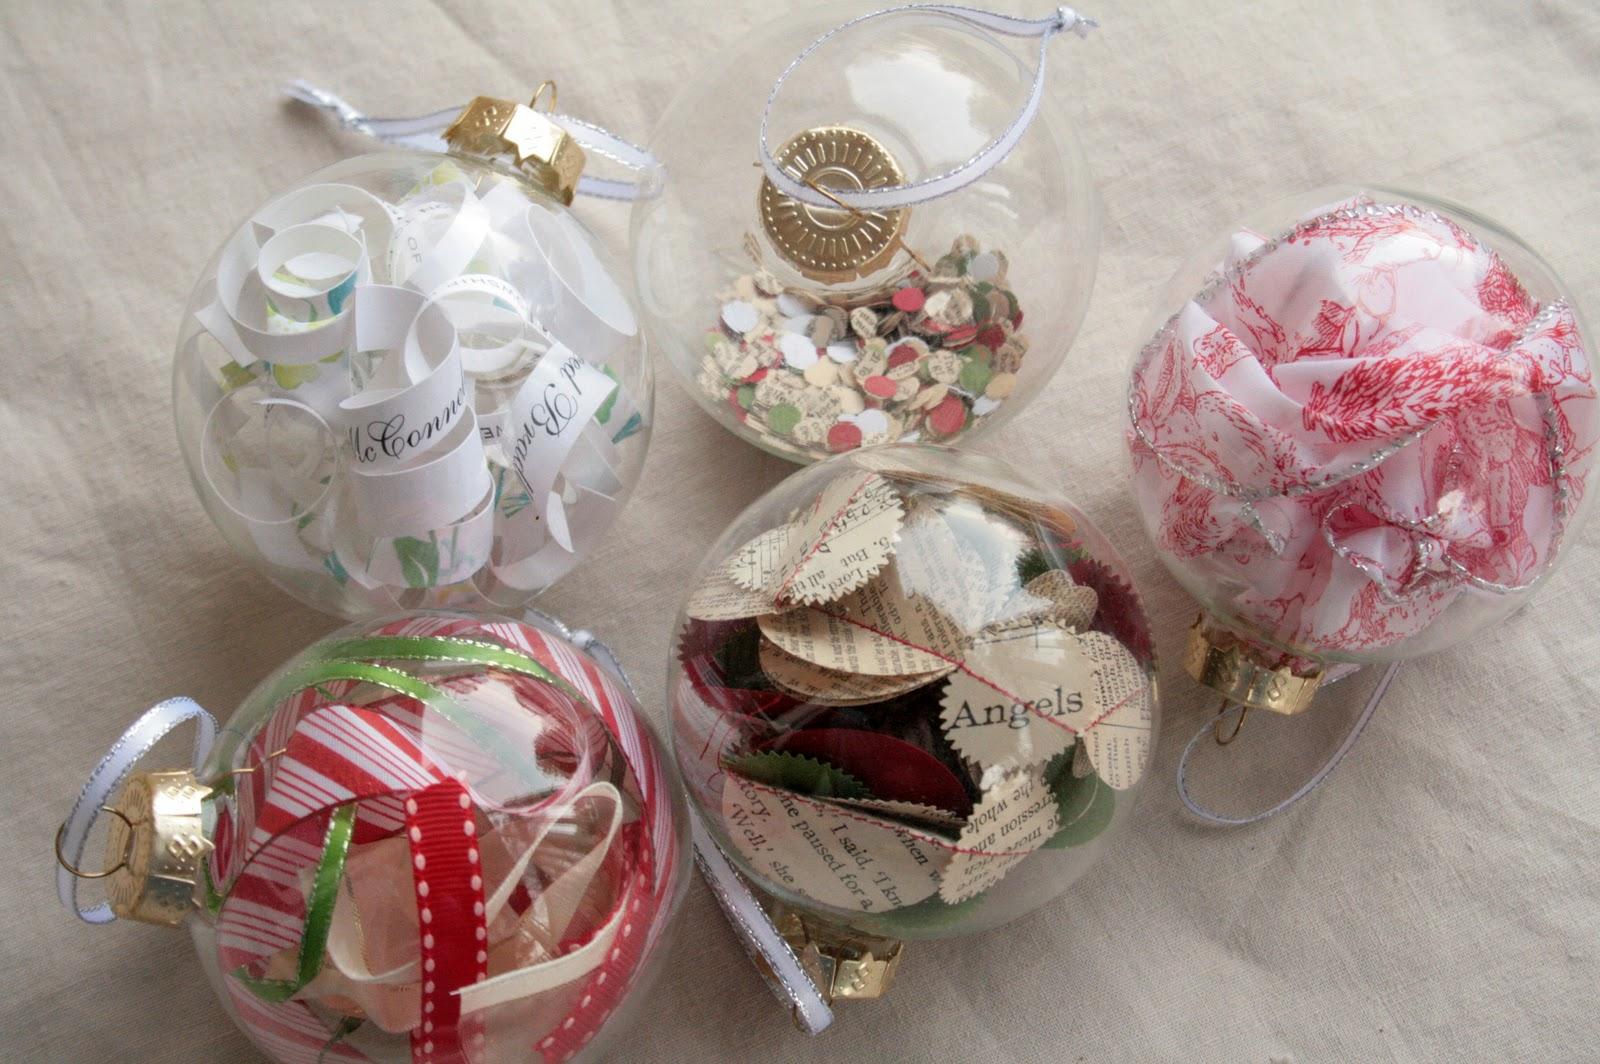 The Creative Place: Handmade Christmas: Ornaments